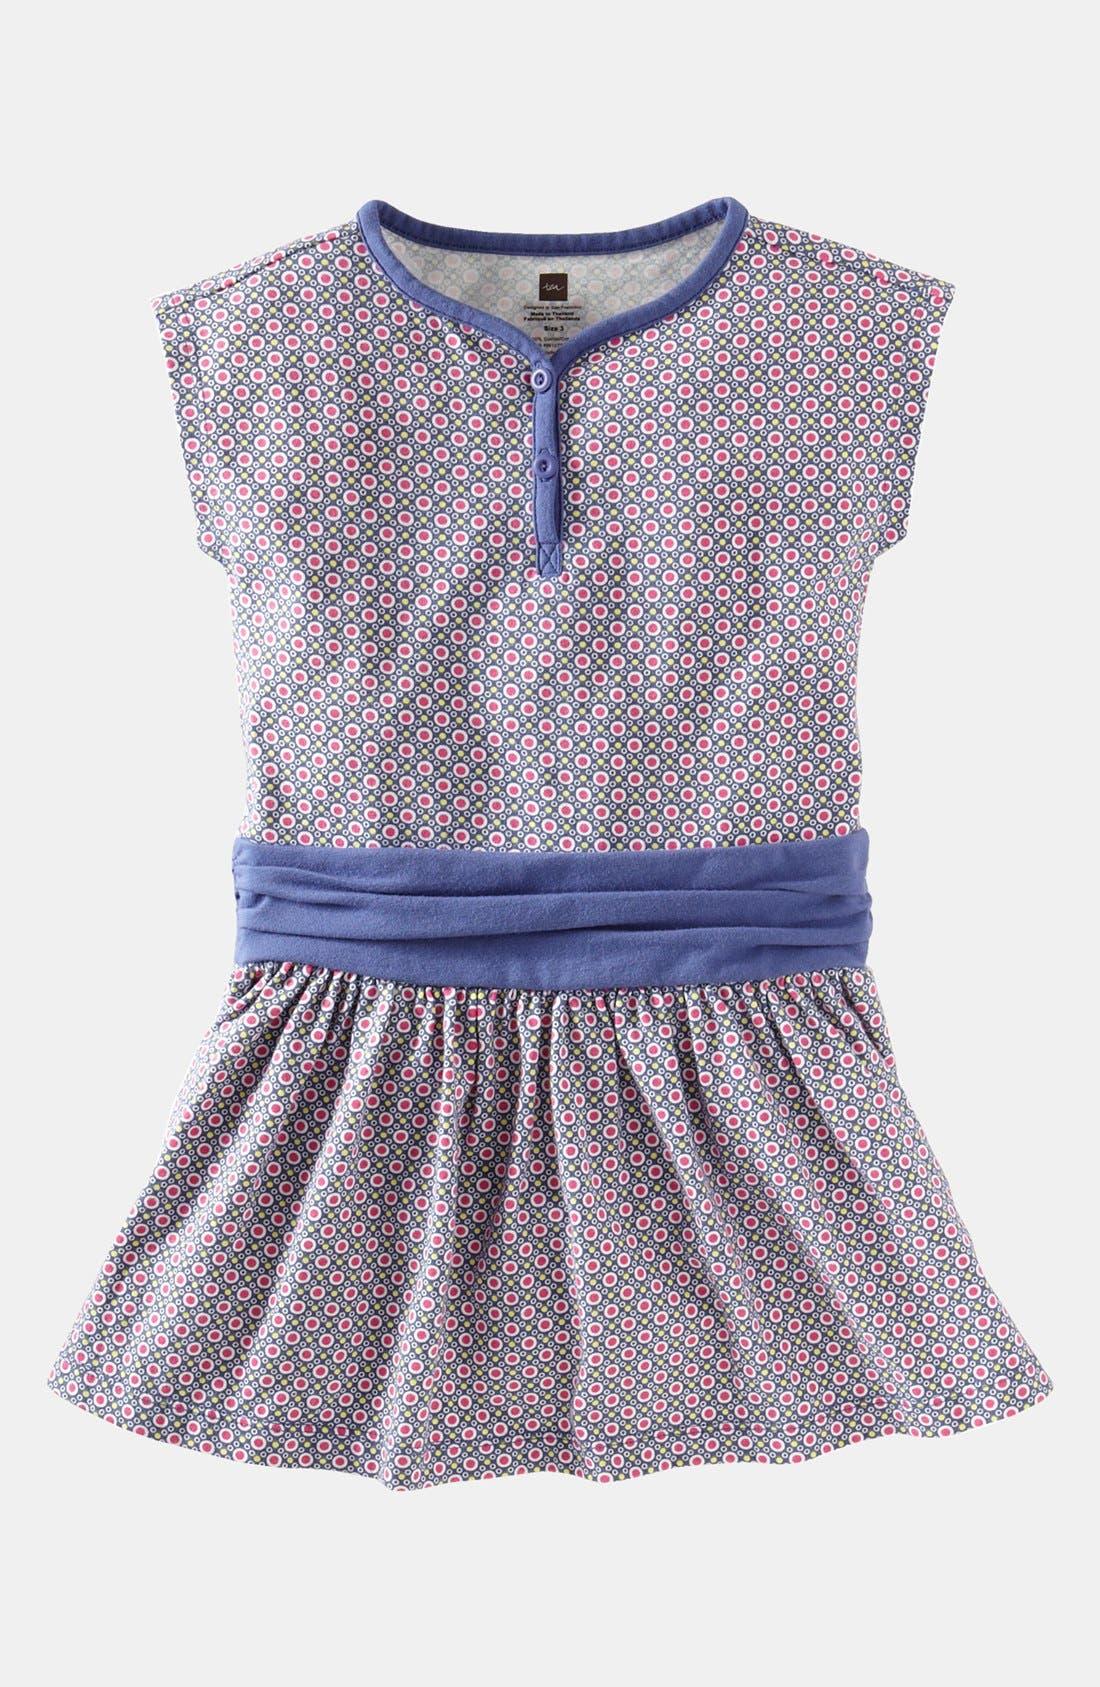 Alternate Image 1 Selected - Tea Collection 'Beijing Dot' Henley Dress (Toddler Girls)